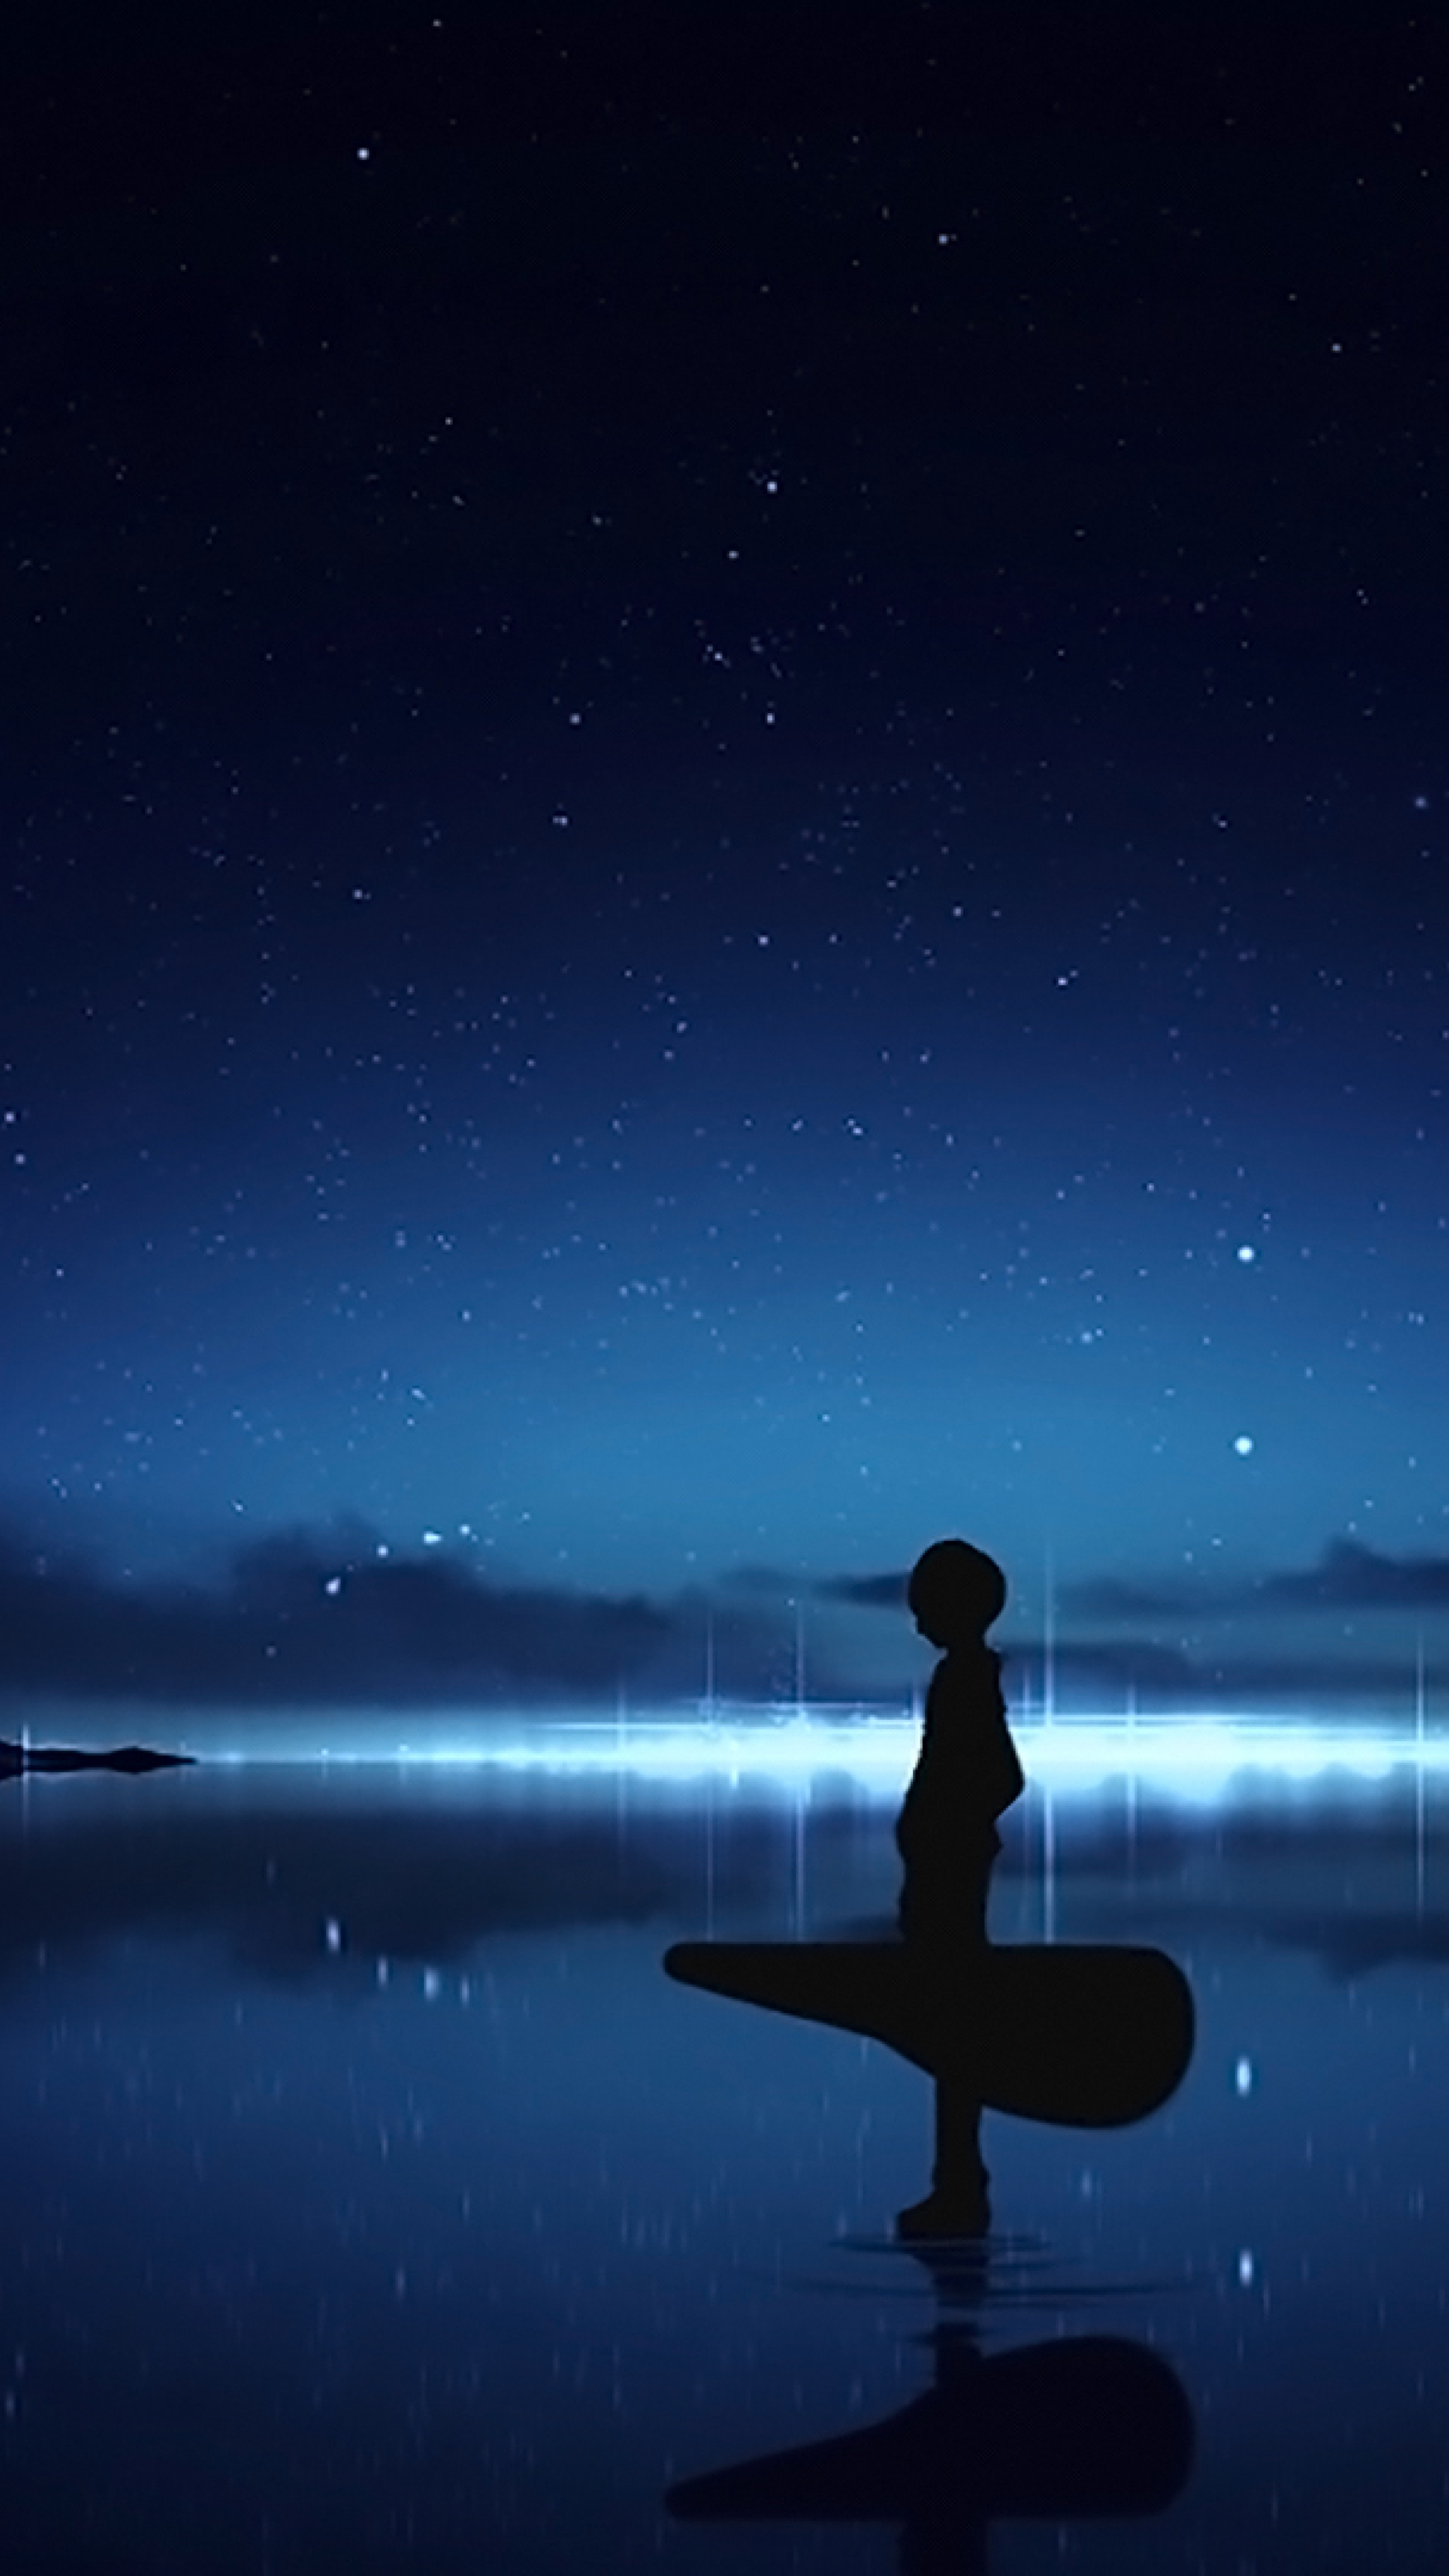 alone boy hd wallpaper,sky,water,atmosphere,horizon,light